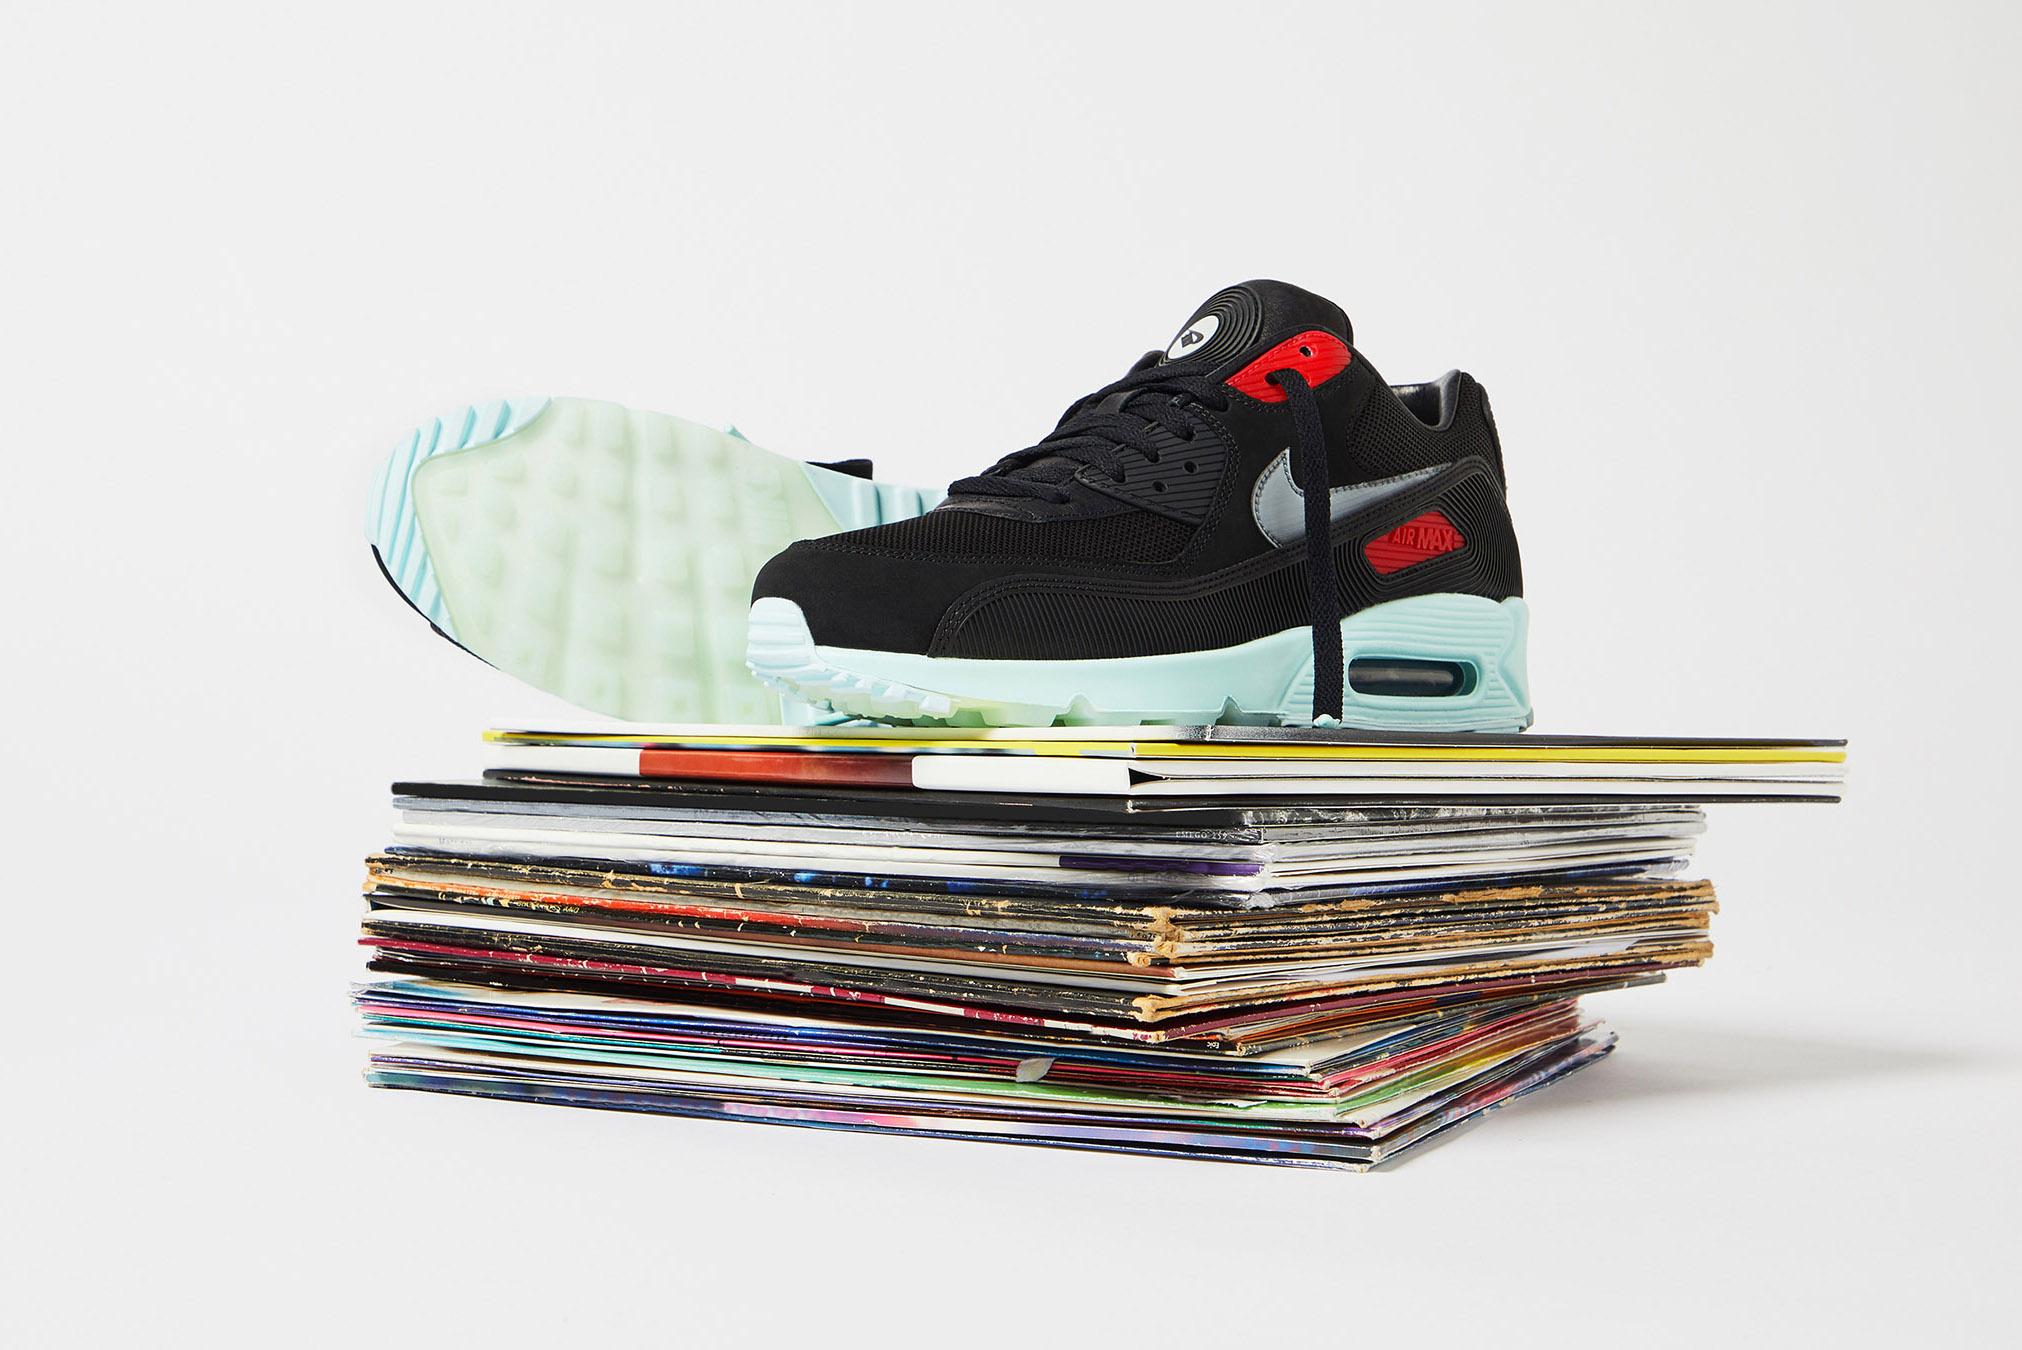 END. Features | Nike Air Max 90 Premium 'Vinyl' - Register Now on ...